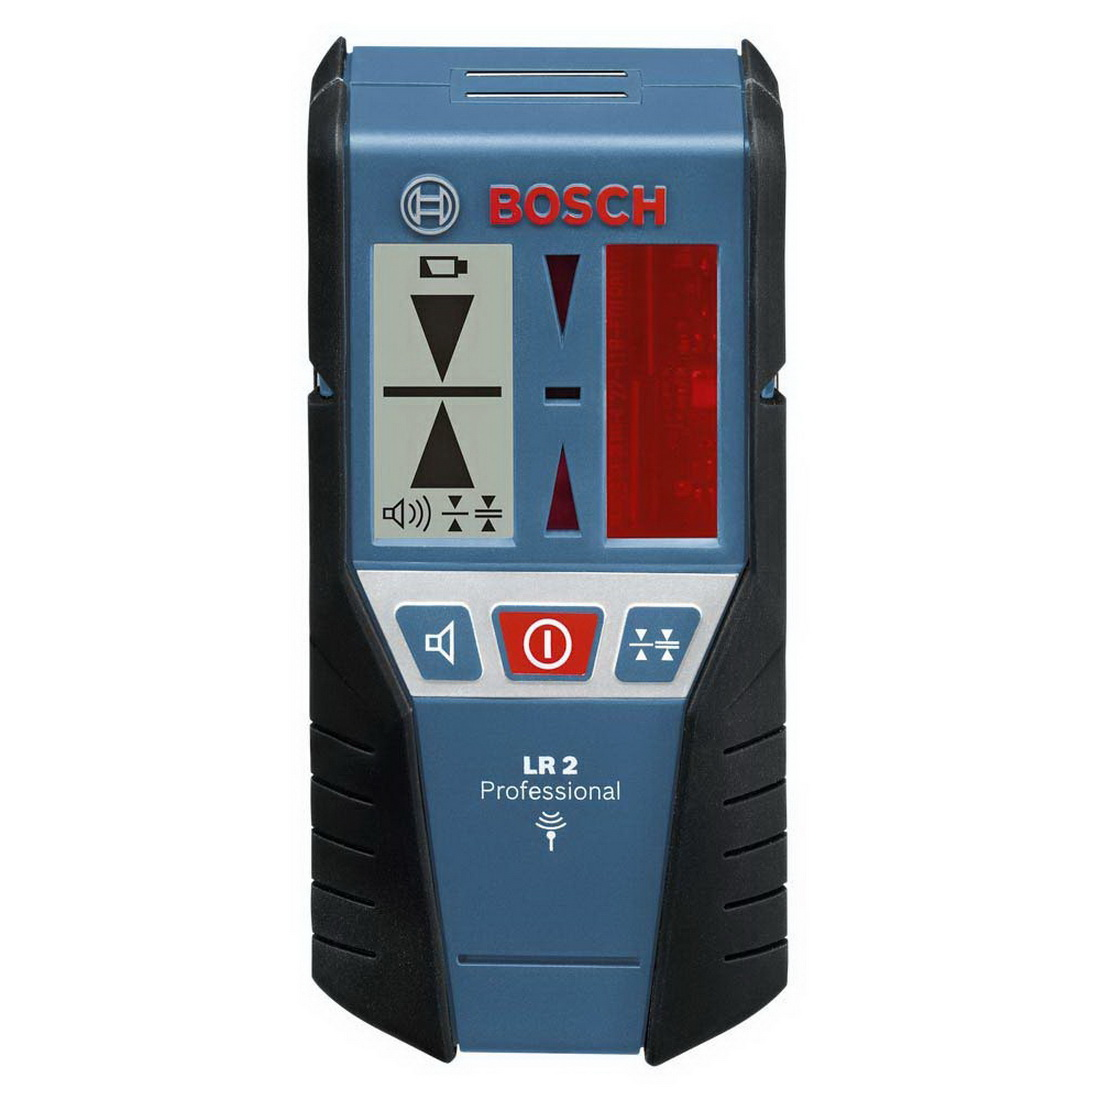 LR 2 Professional High-Performance Laser Receiver 5-50m 74 x 41mm 601069100